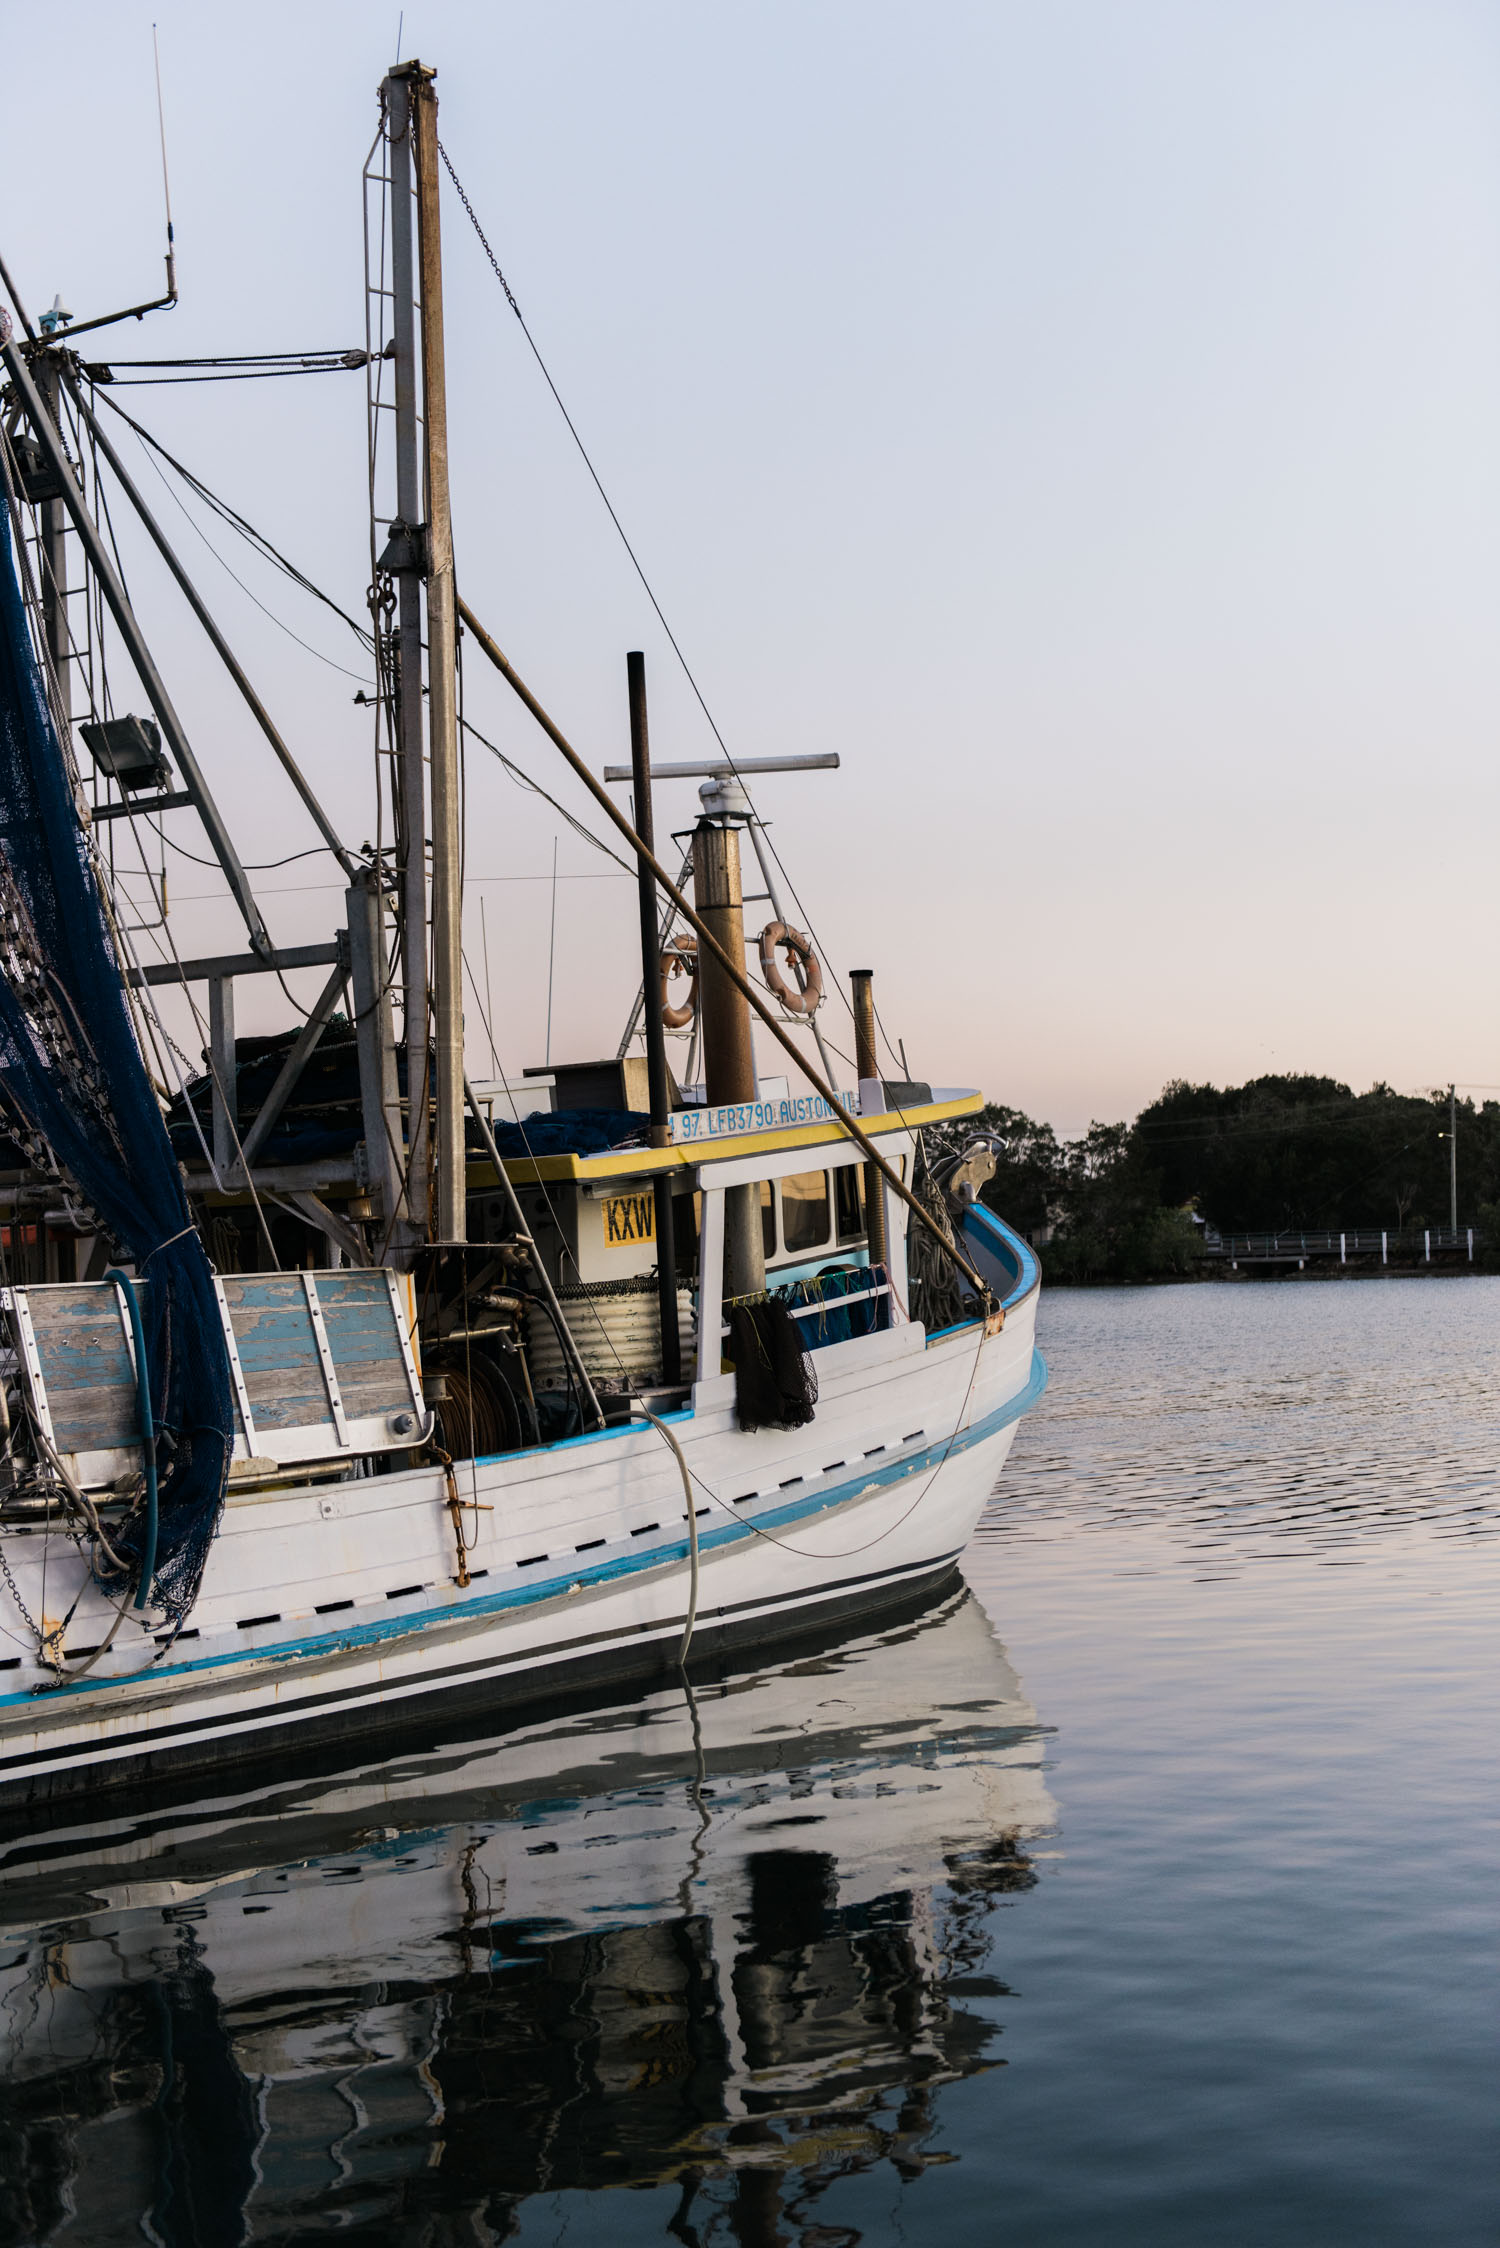 hannahpuechmarin-yamba marina-australiantravelphotographer-5.jpg